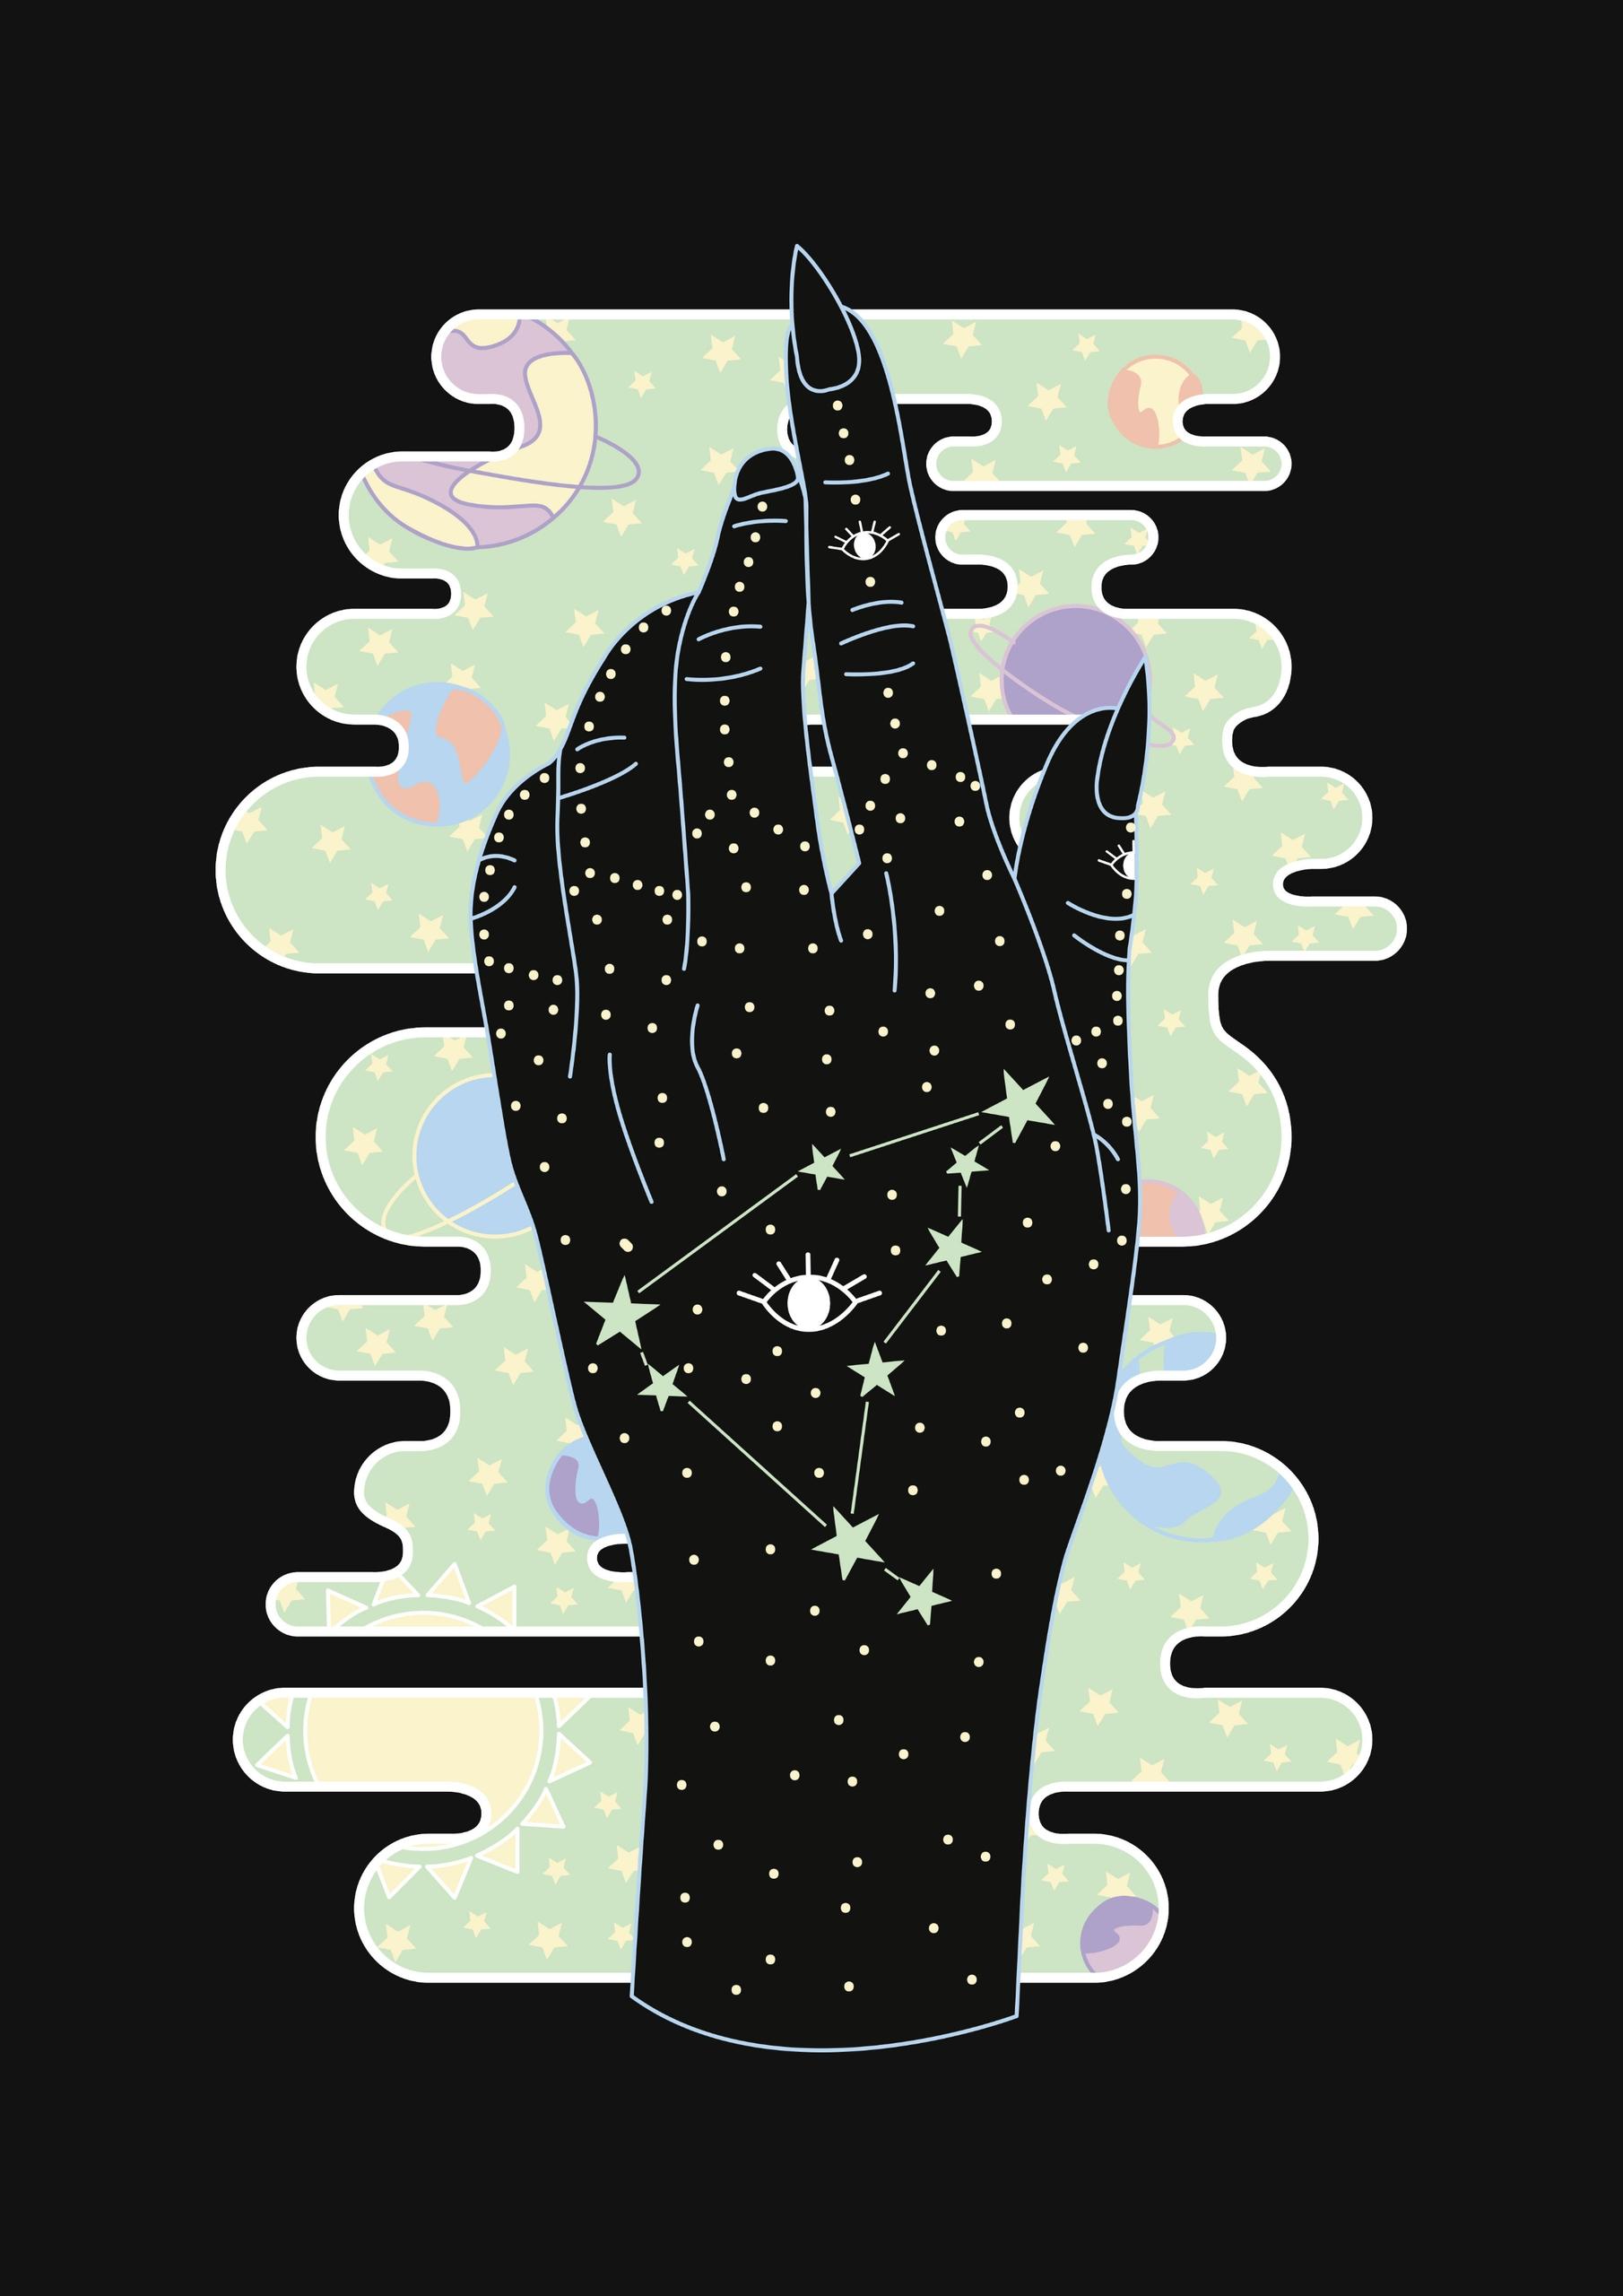 Capricorn Zodiac Constellation  - mrkttnr | ello